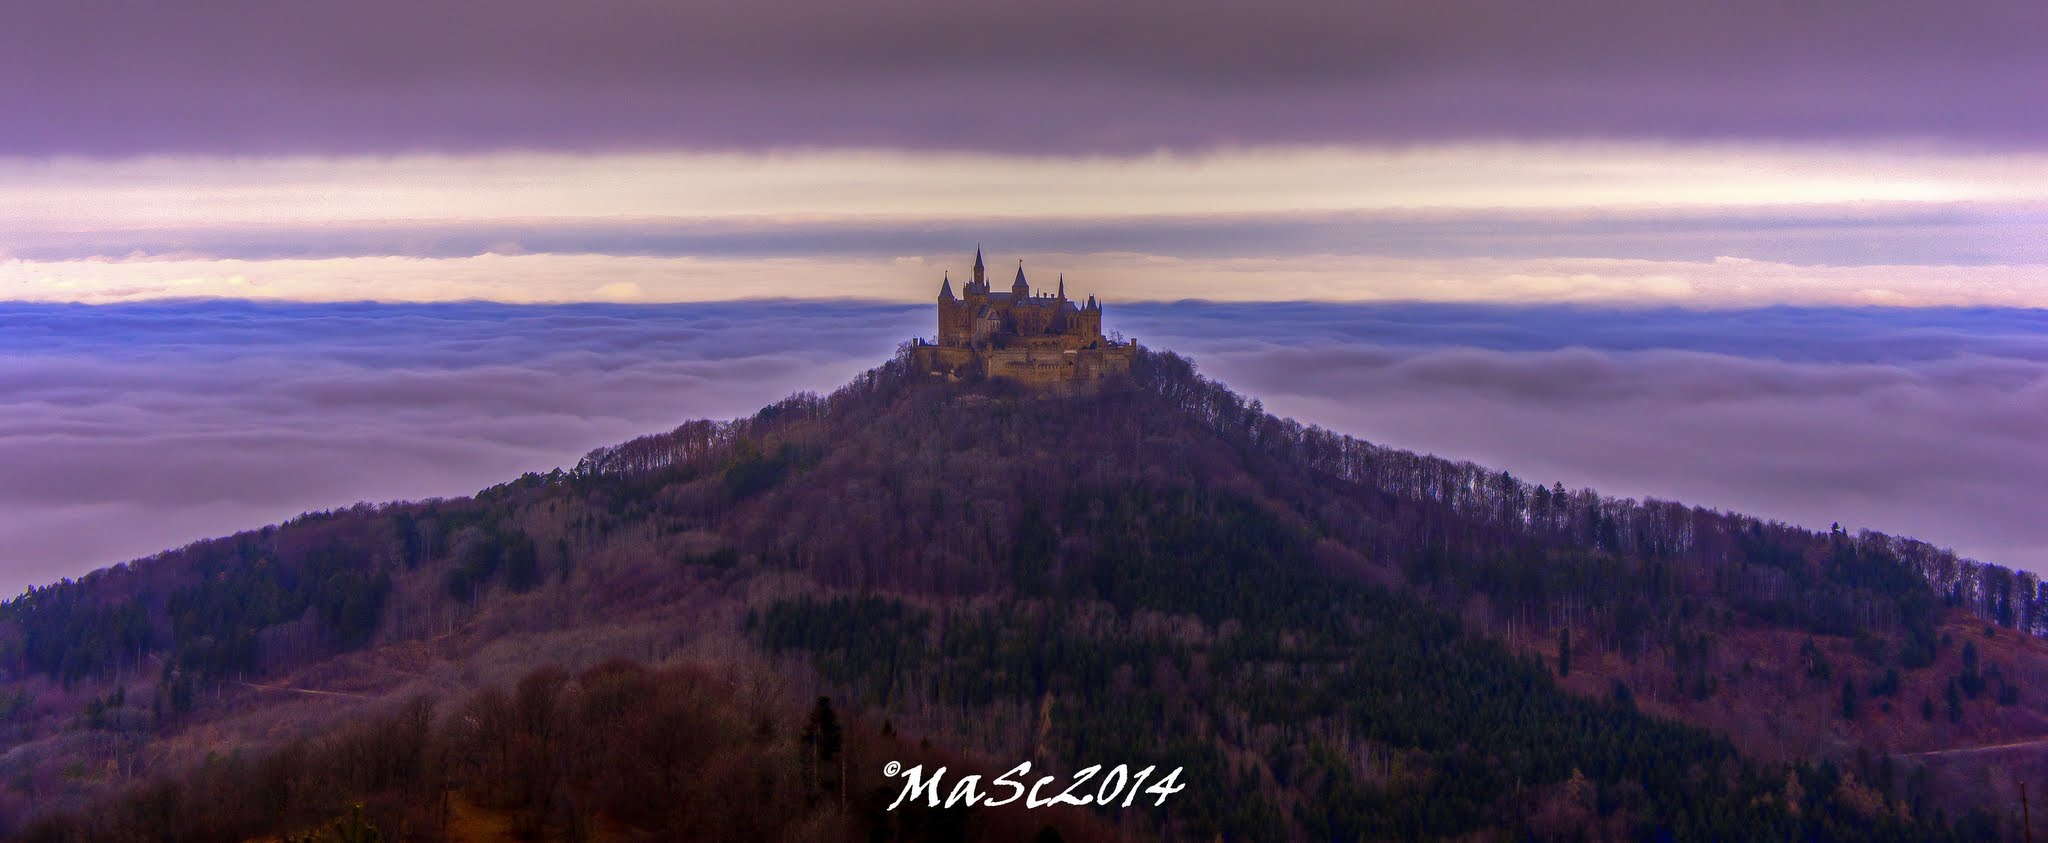 Hohenzollern - 2ter Versuch